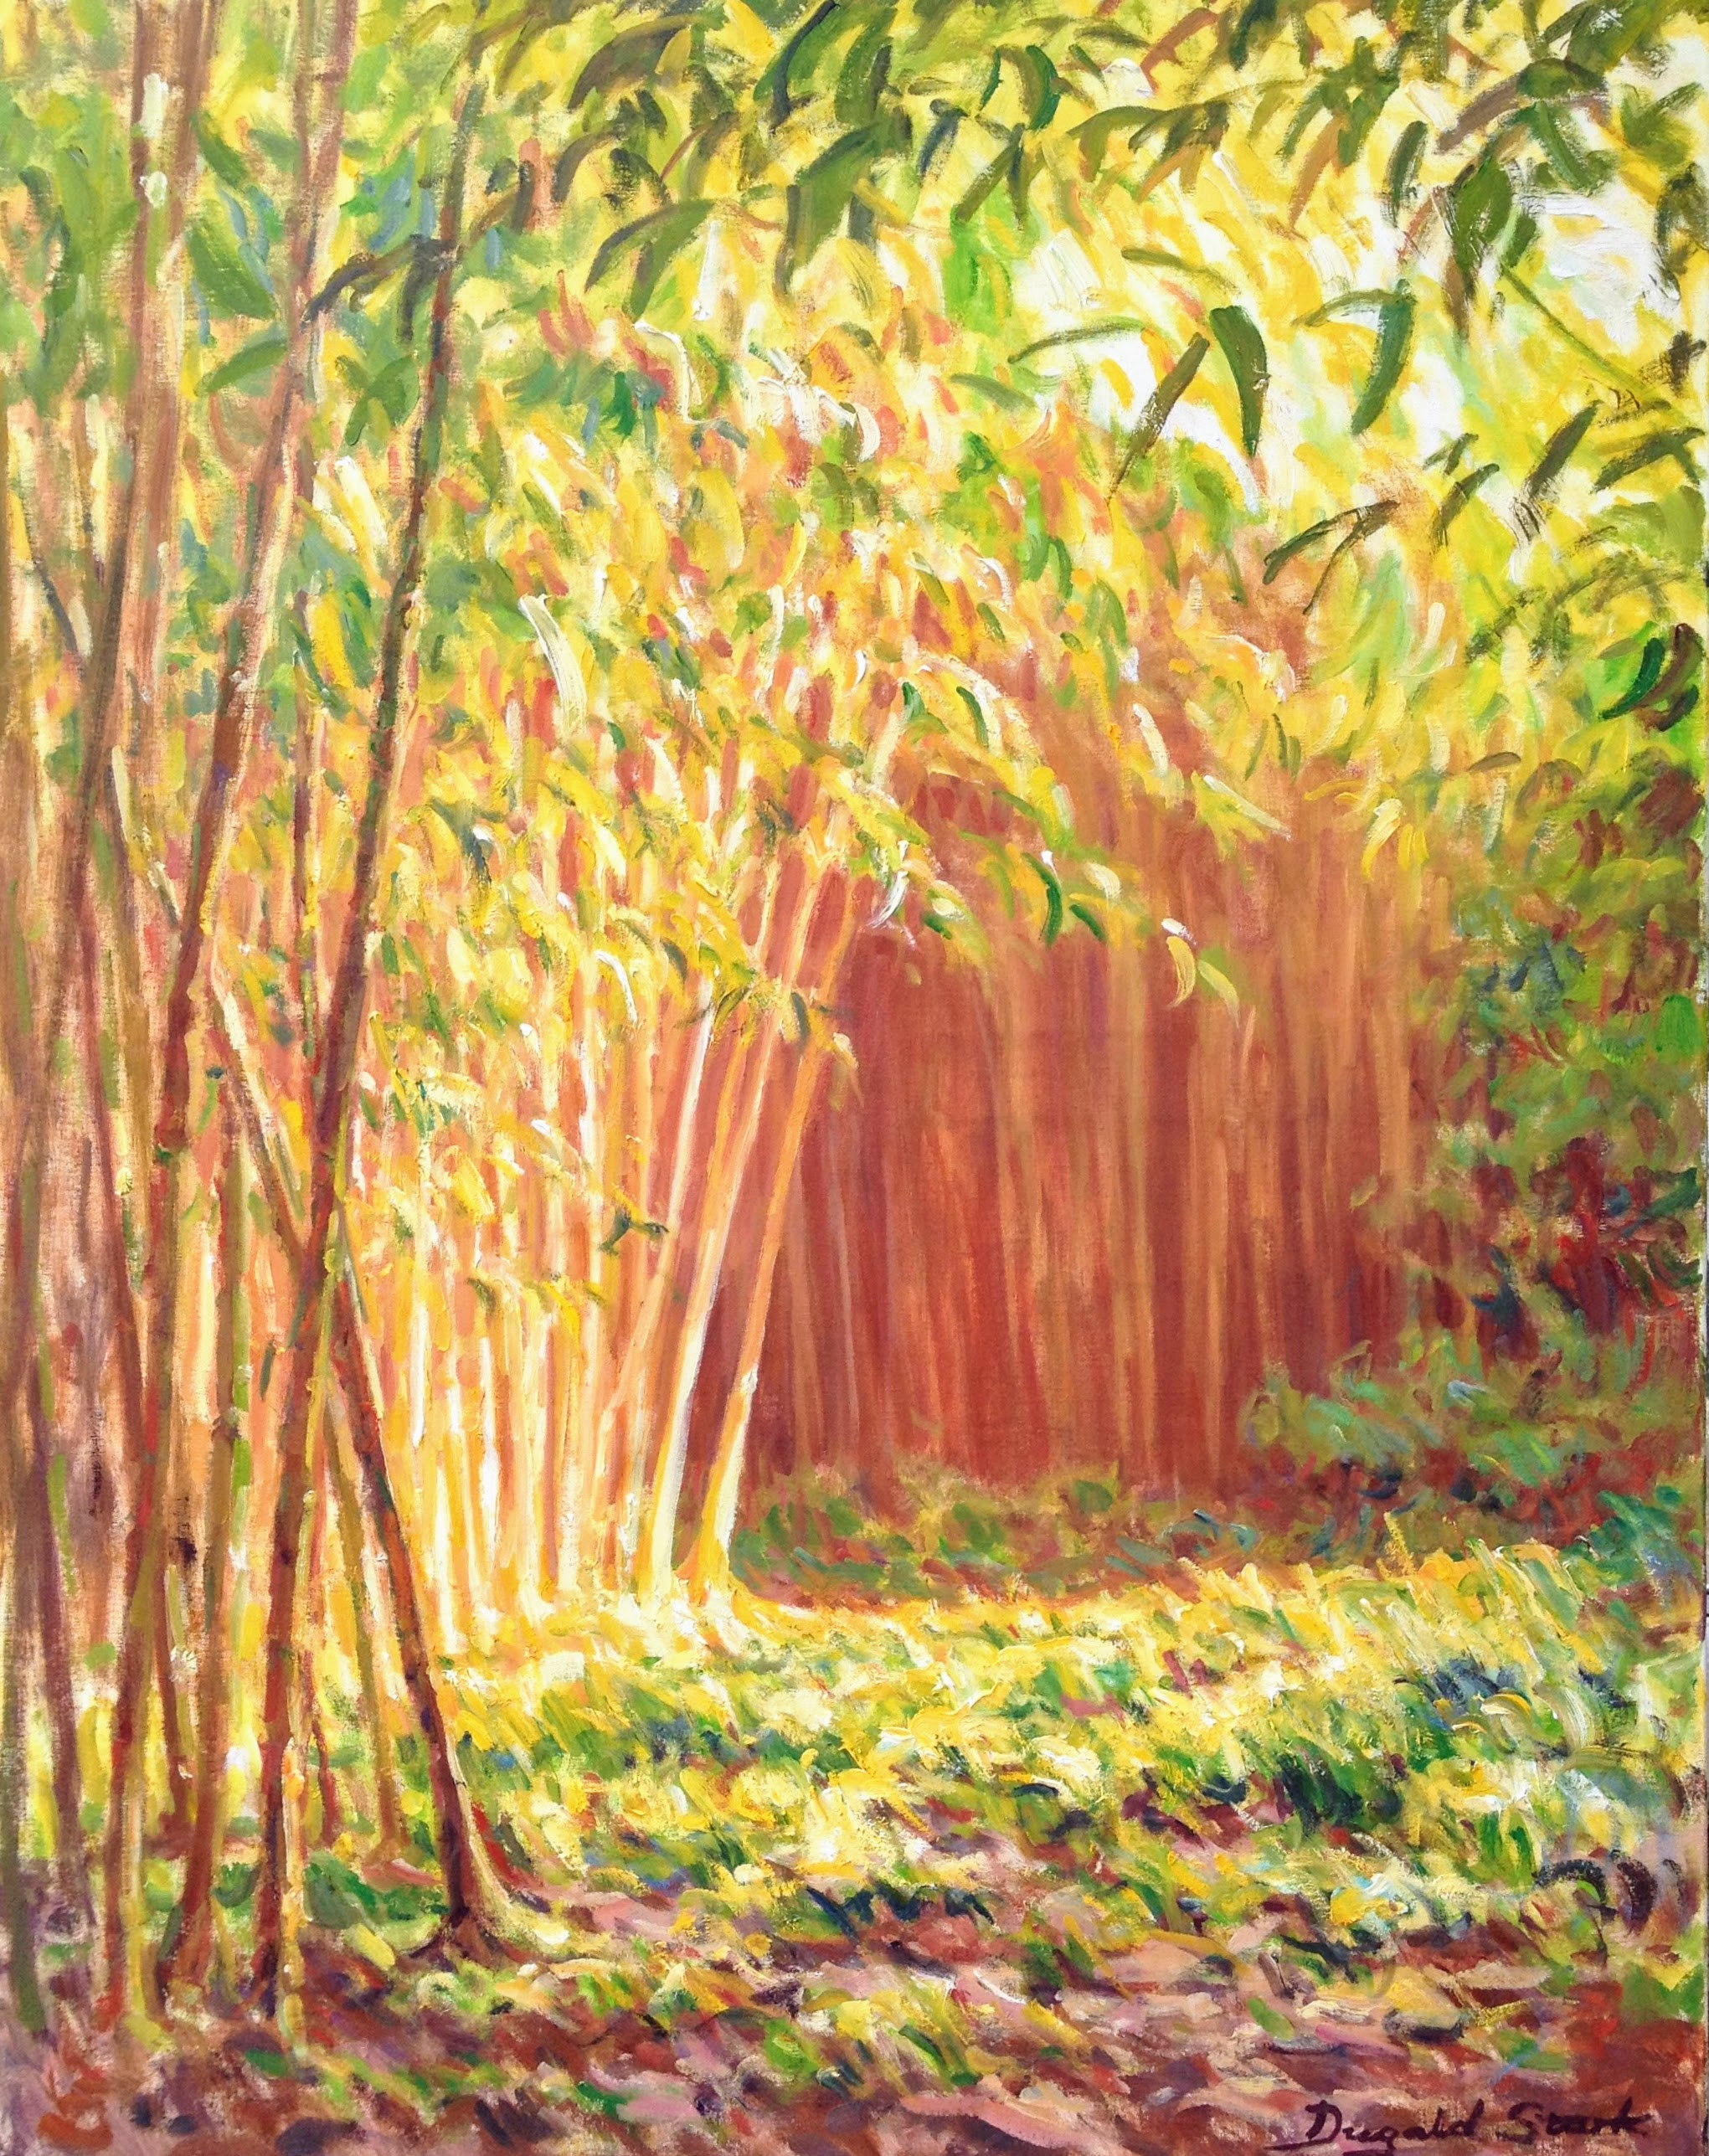 Sun in the Bamboo Grove